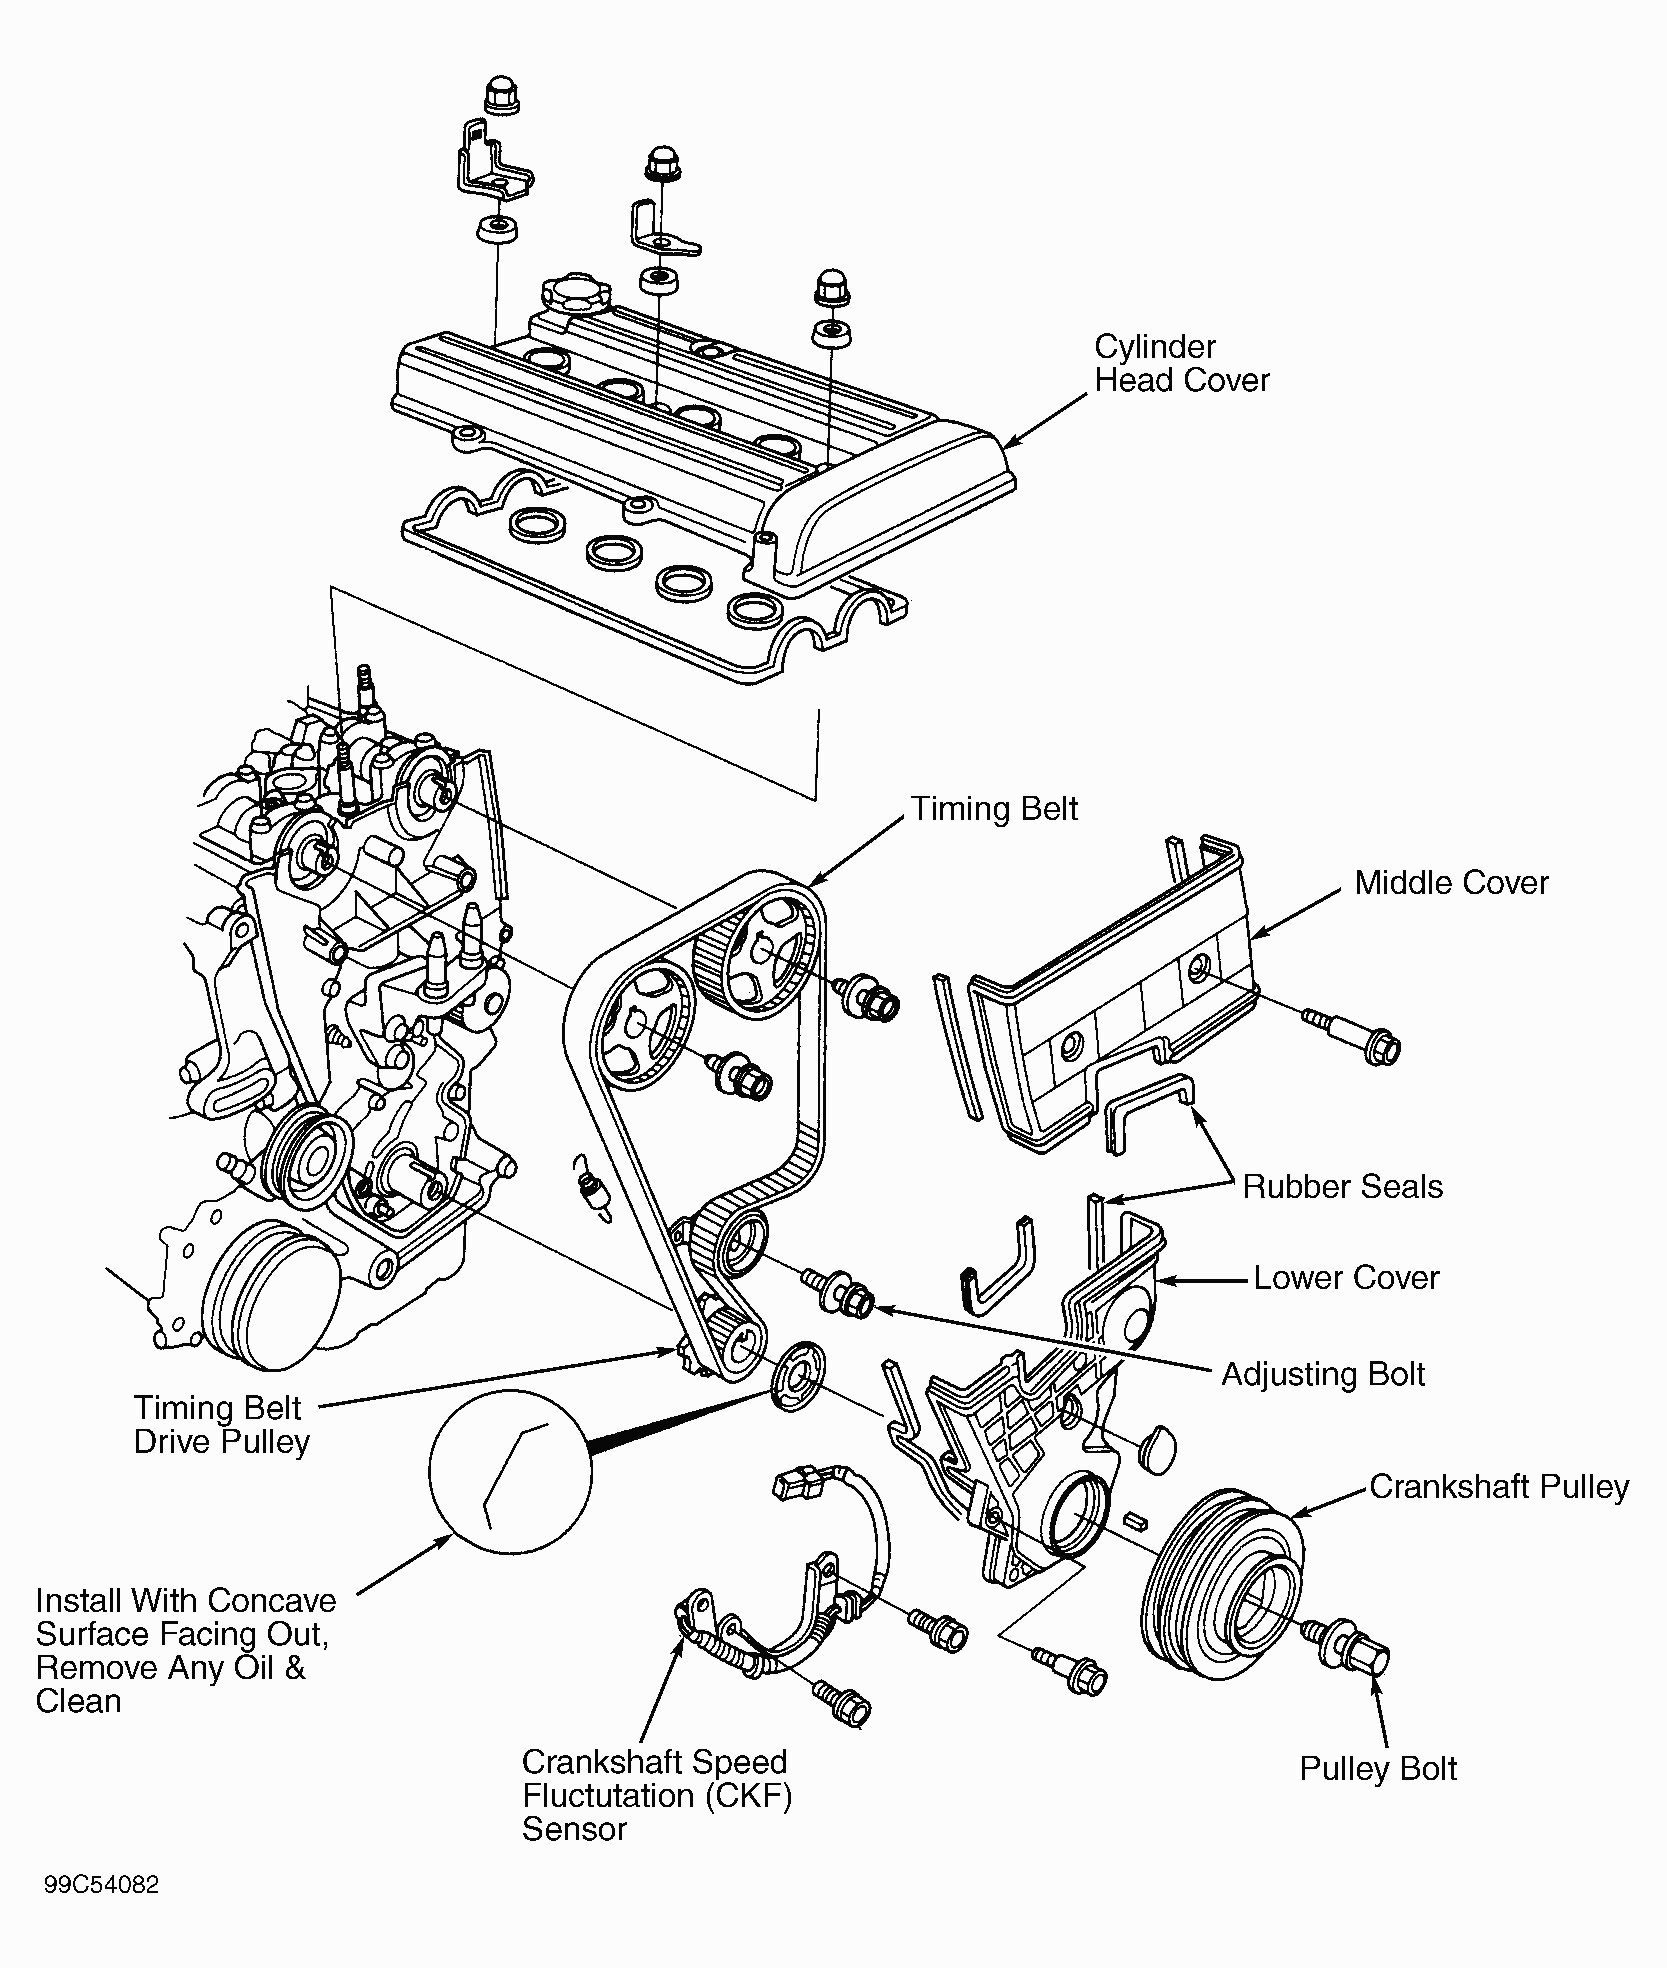 Honda B18c Wiring Diagram | Wiring Schematic Diagram on